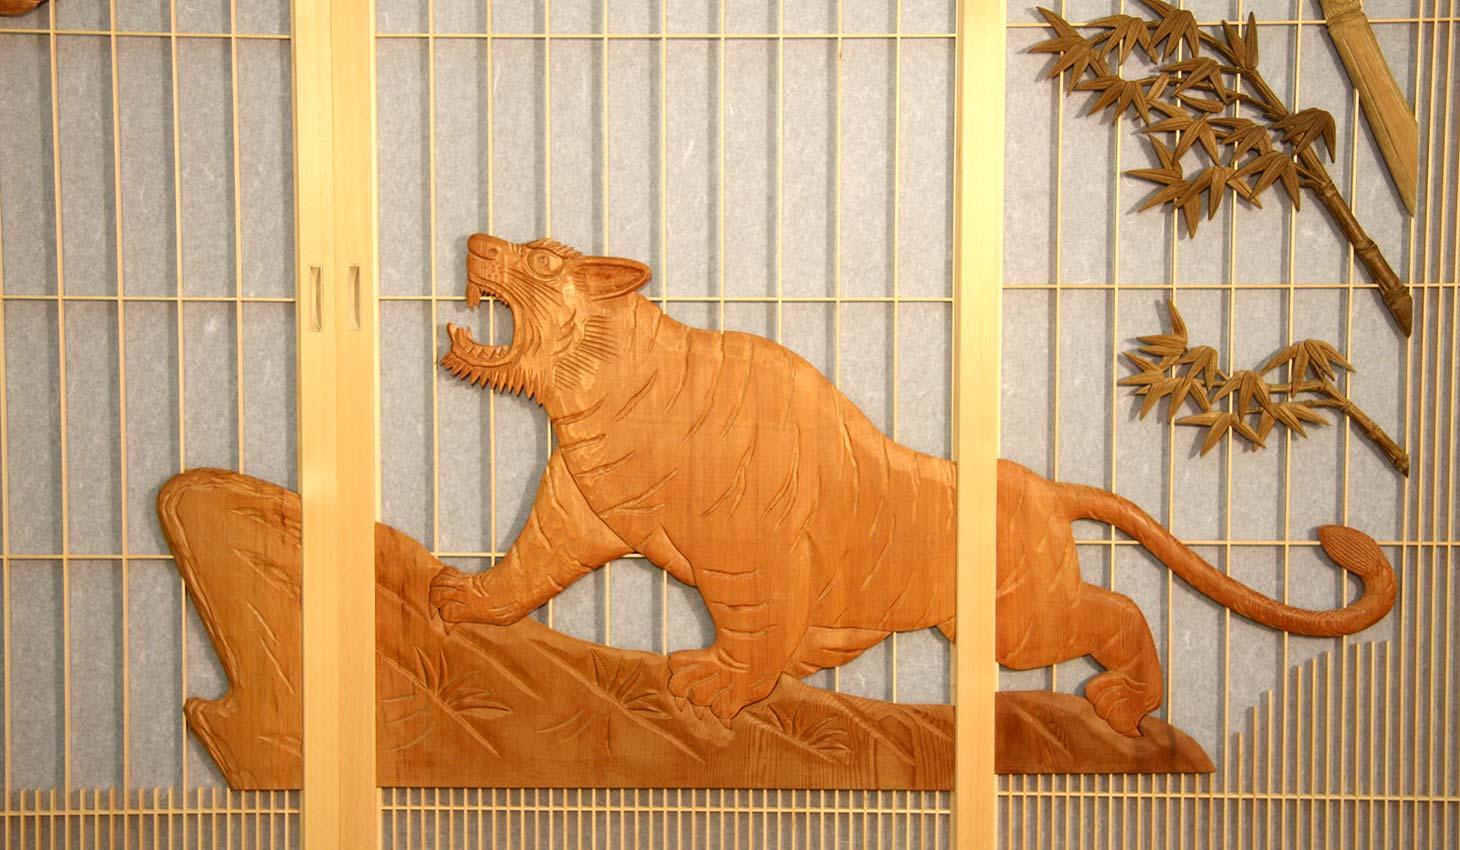 龍虎彫刻入飾り障子-虎-